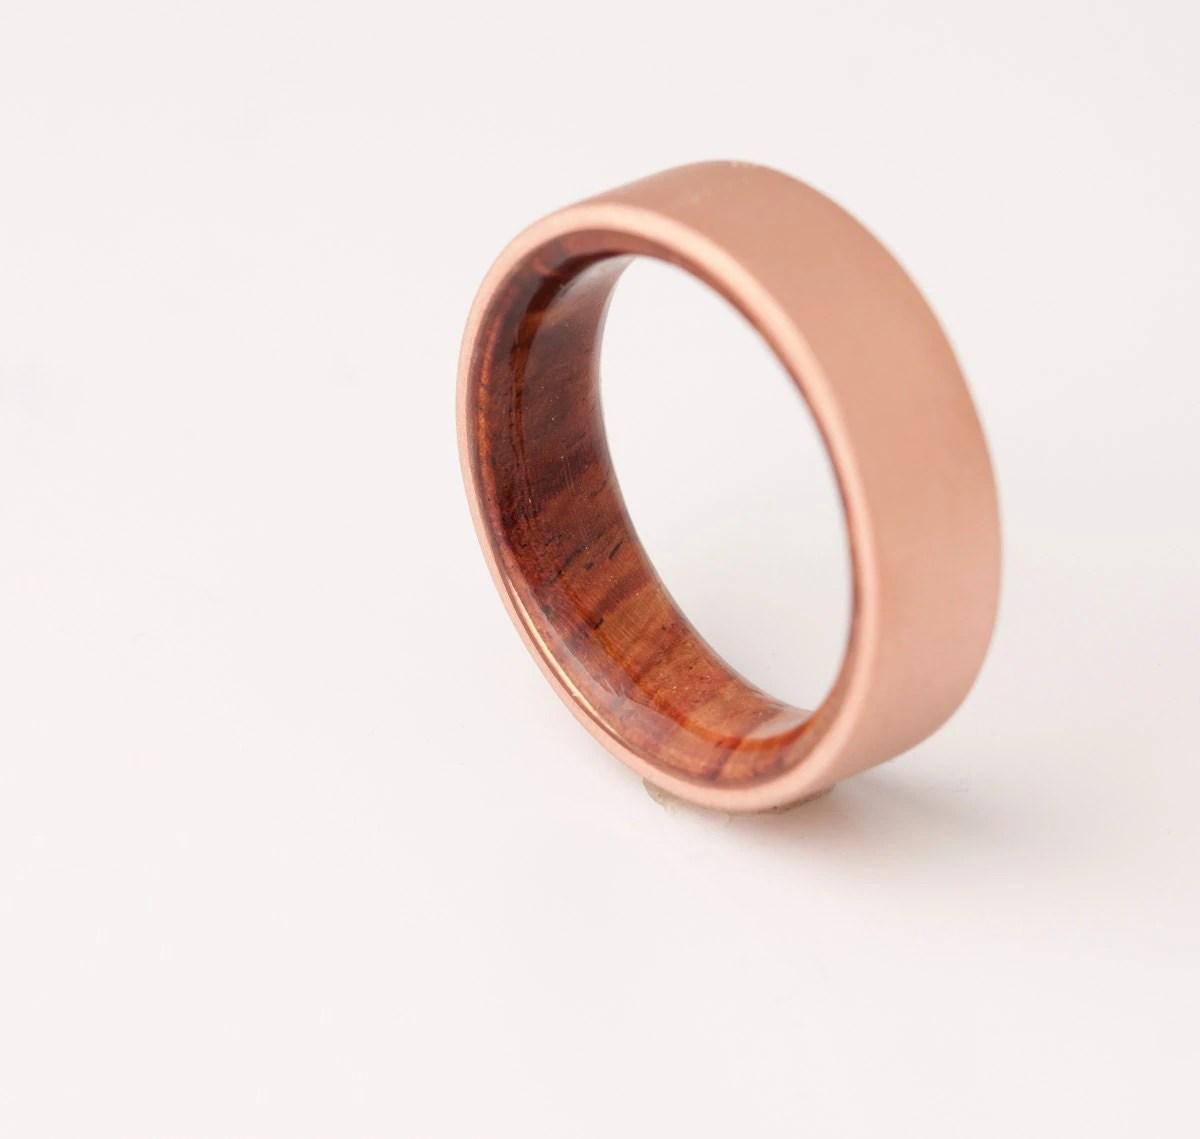 mens wedding ring sports wedding bands Copper Wedding Band Copper Wood Ring Cocobolo Ring Man Ring mens wood wedding band